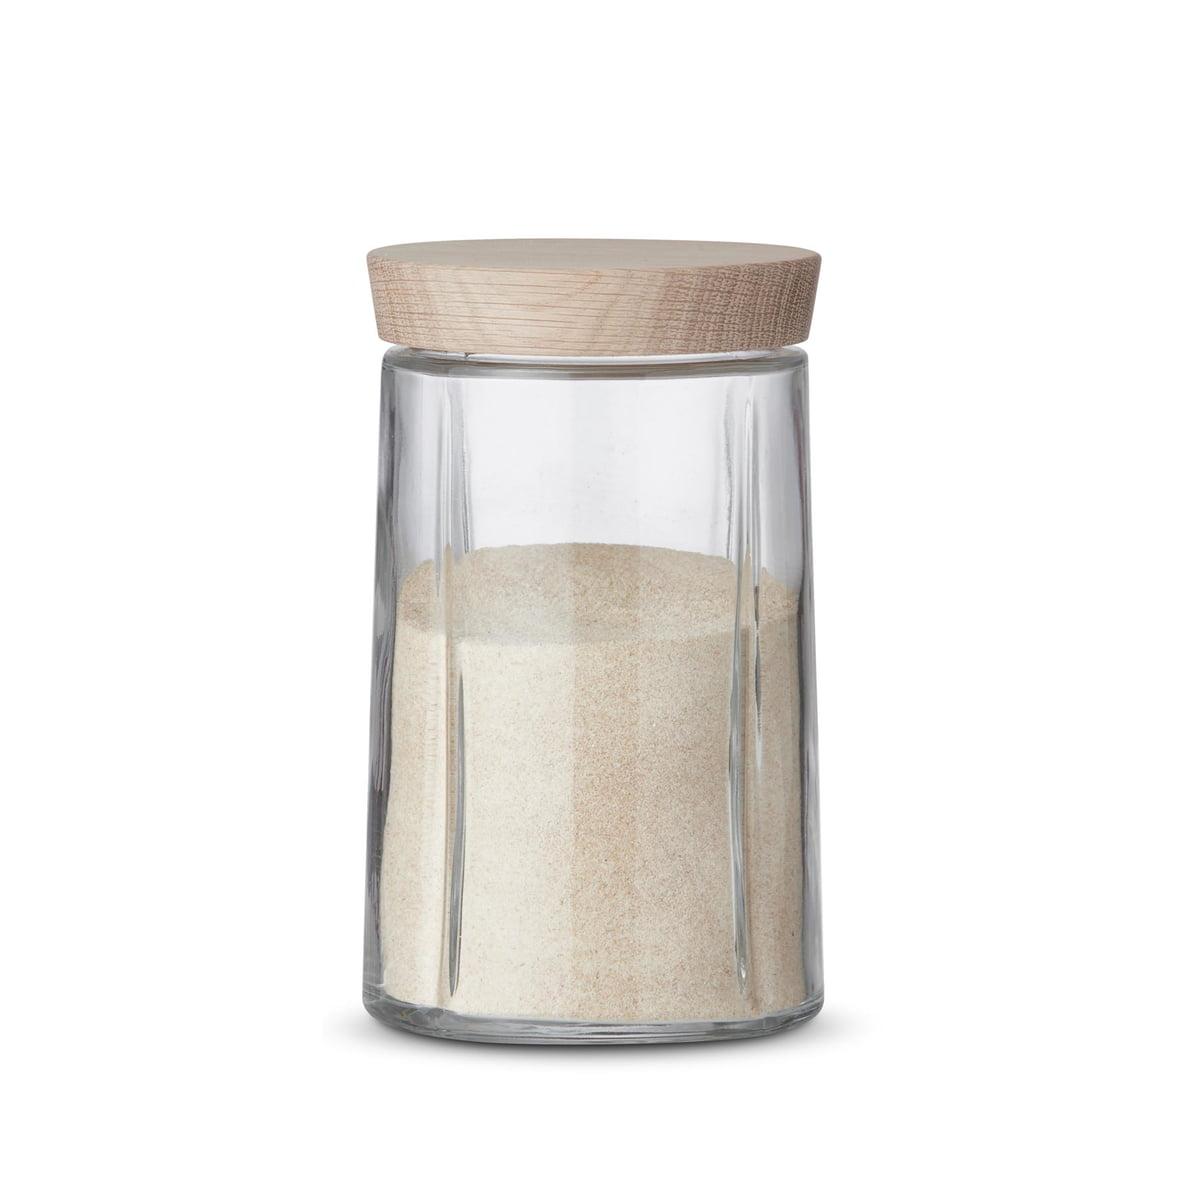 Rosendahl - Grand Cru bocaux en verre / chêne, 1,0 litre